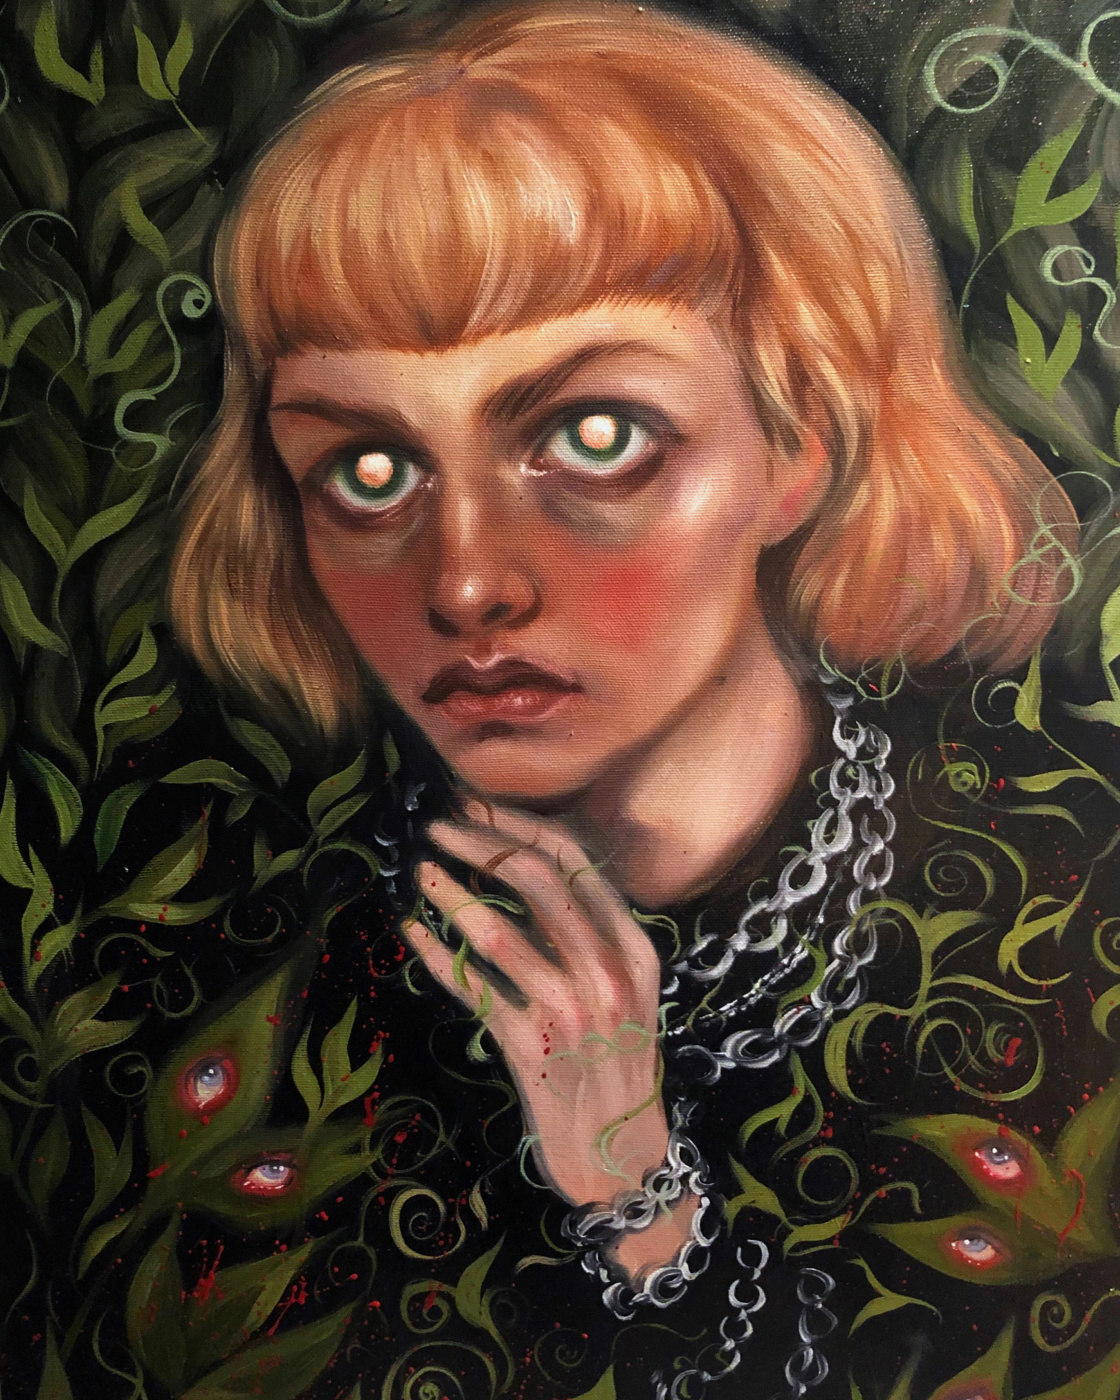 Uliana Dostoevskaya. Outlander